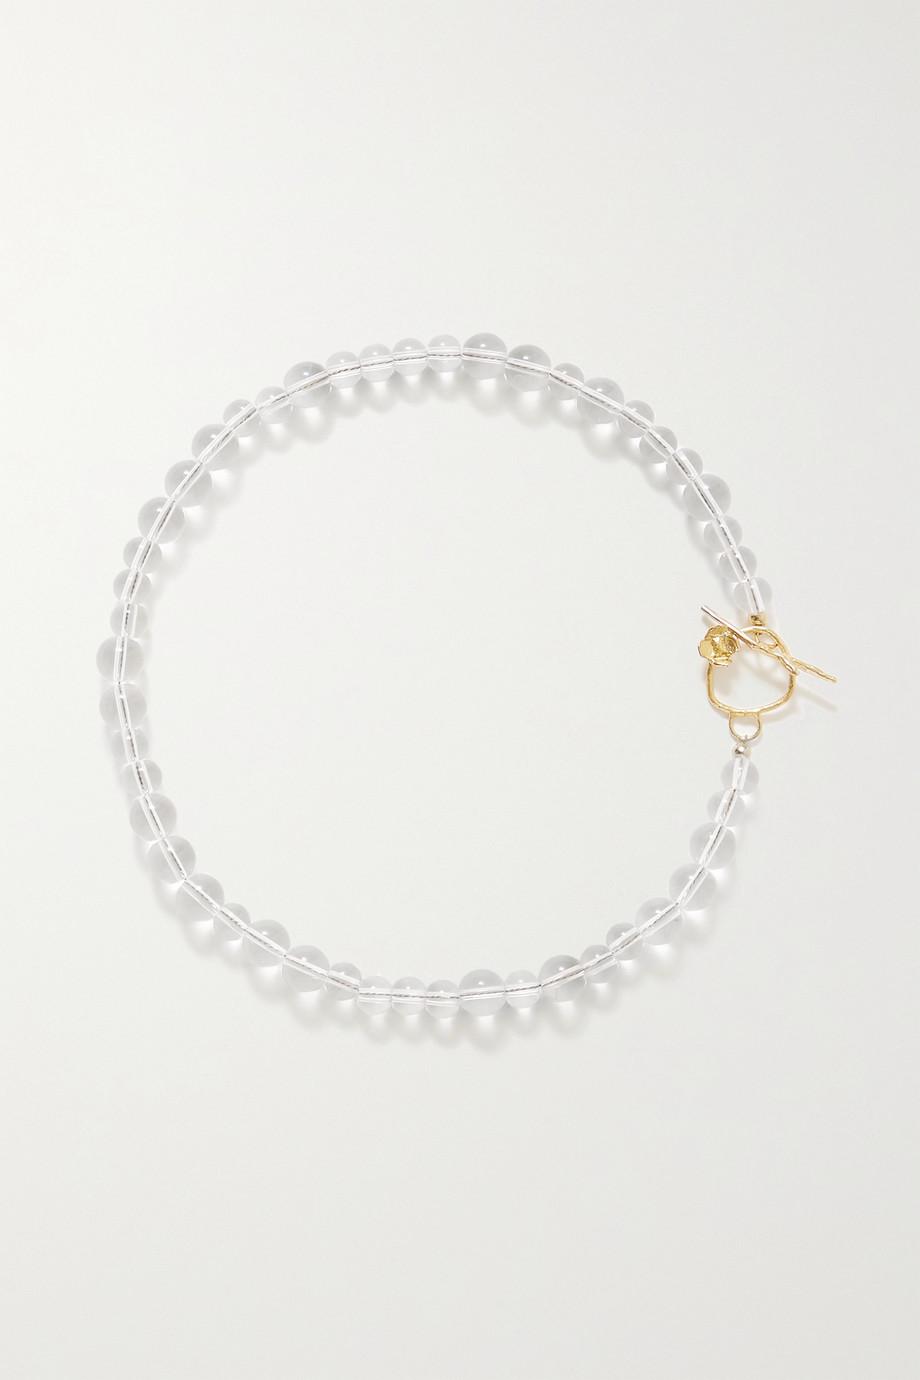 Anita Berisha Petite Bubble Kette aus Glas mit Quarzen und goldfarbenen Details